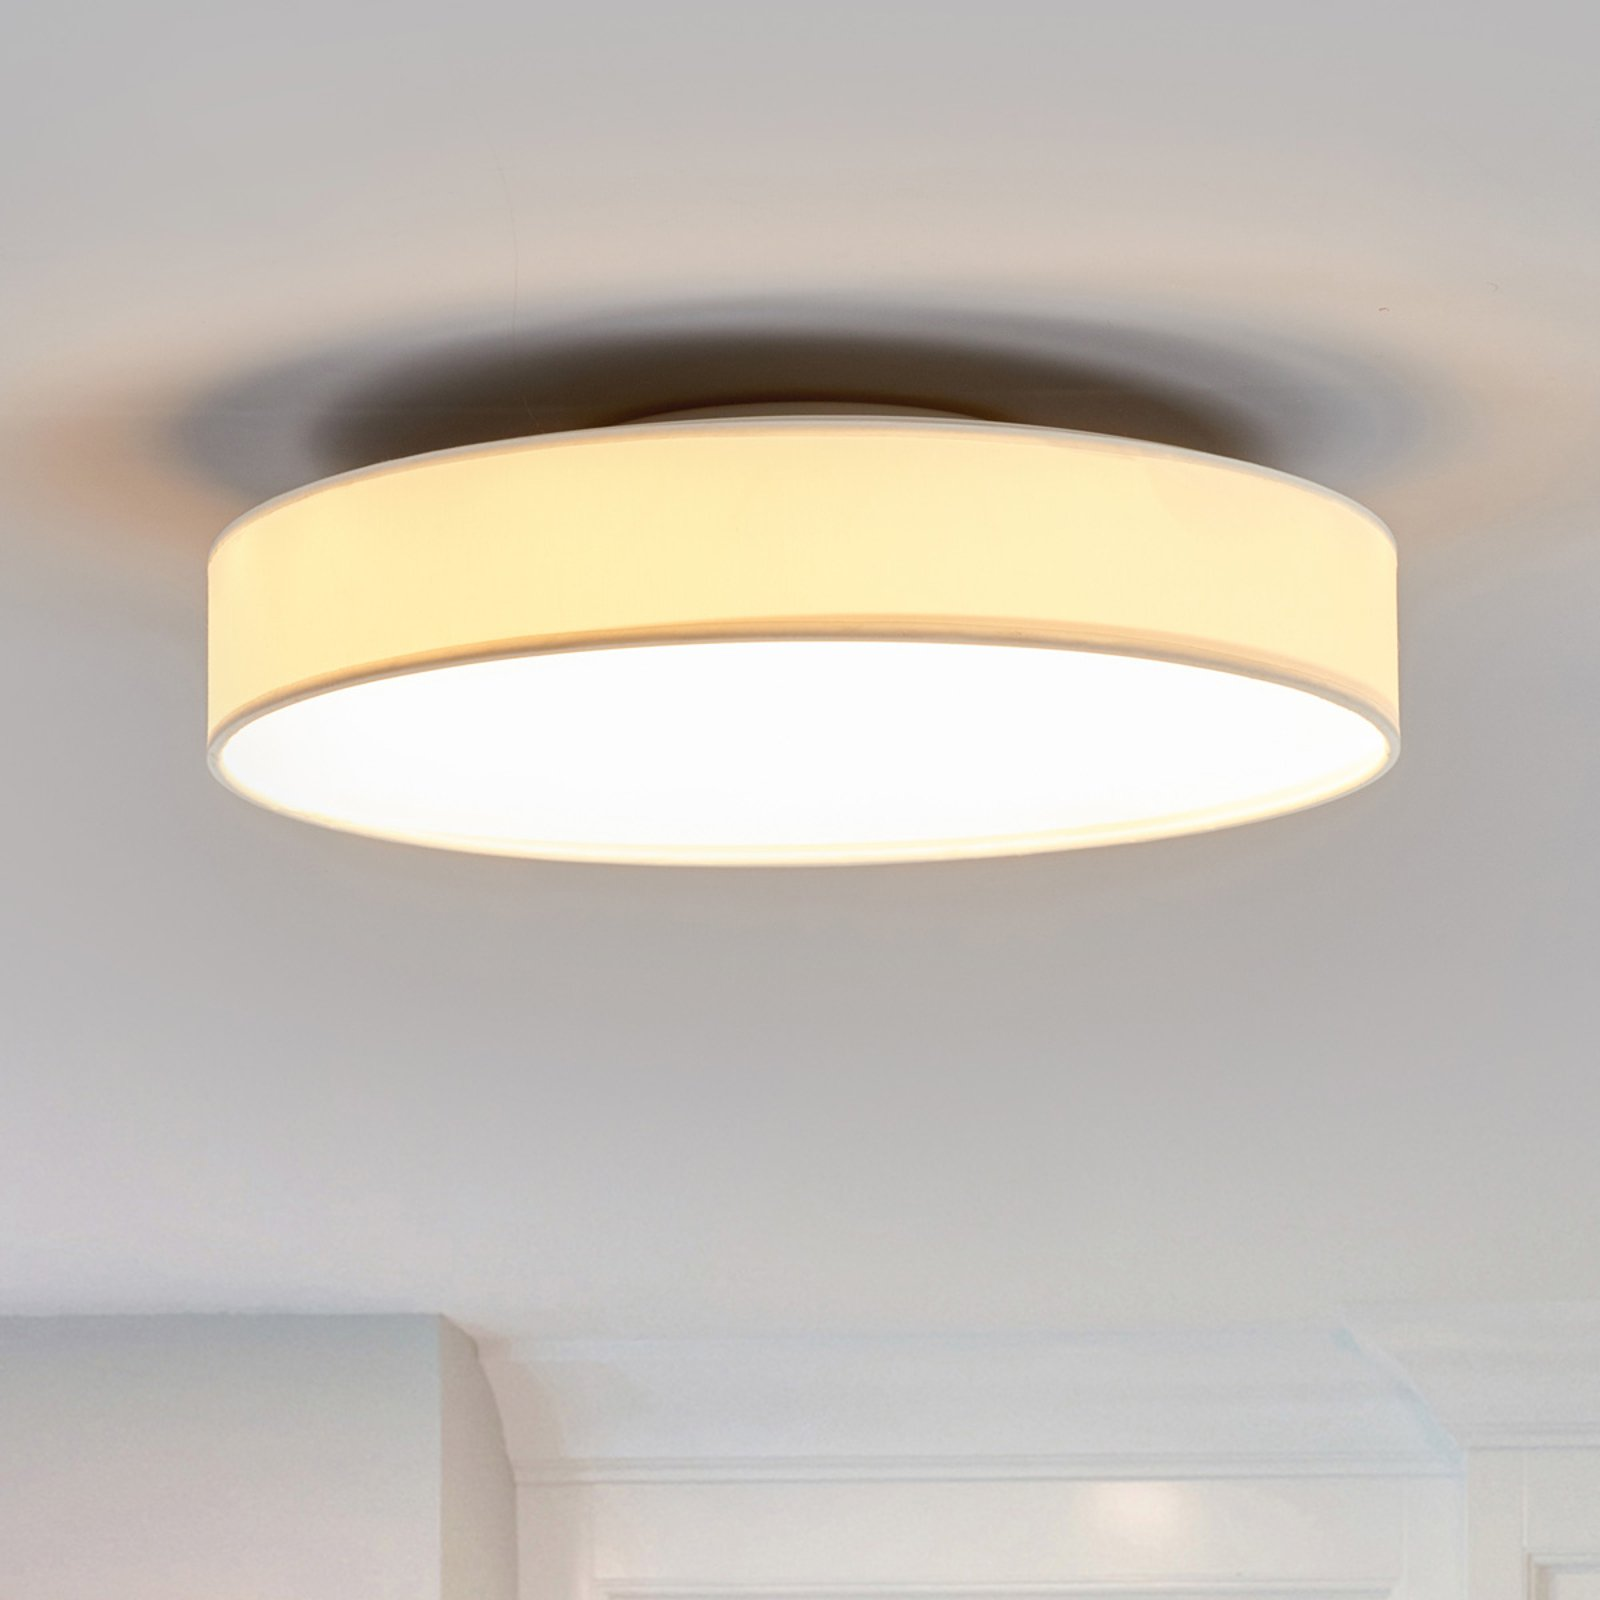 LED-stoff-taklampe Saira, 40 cm, hvit